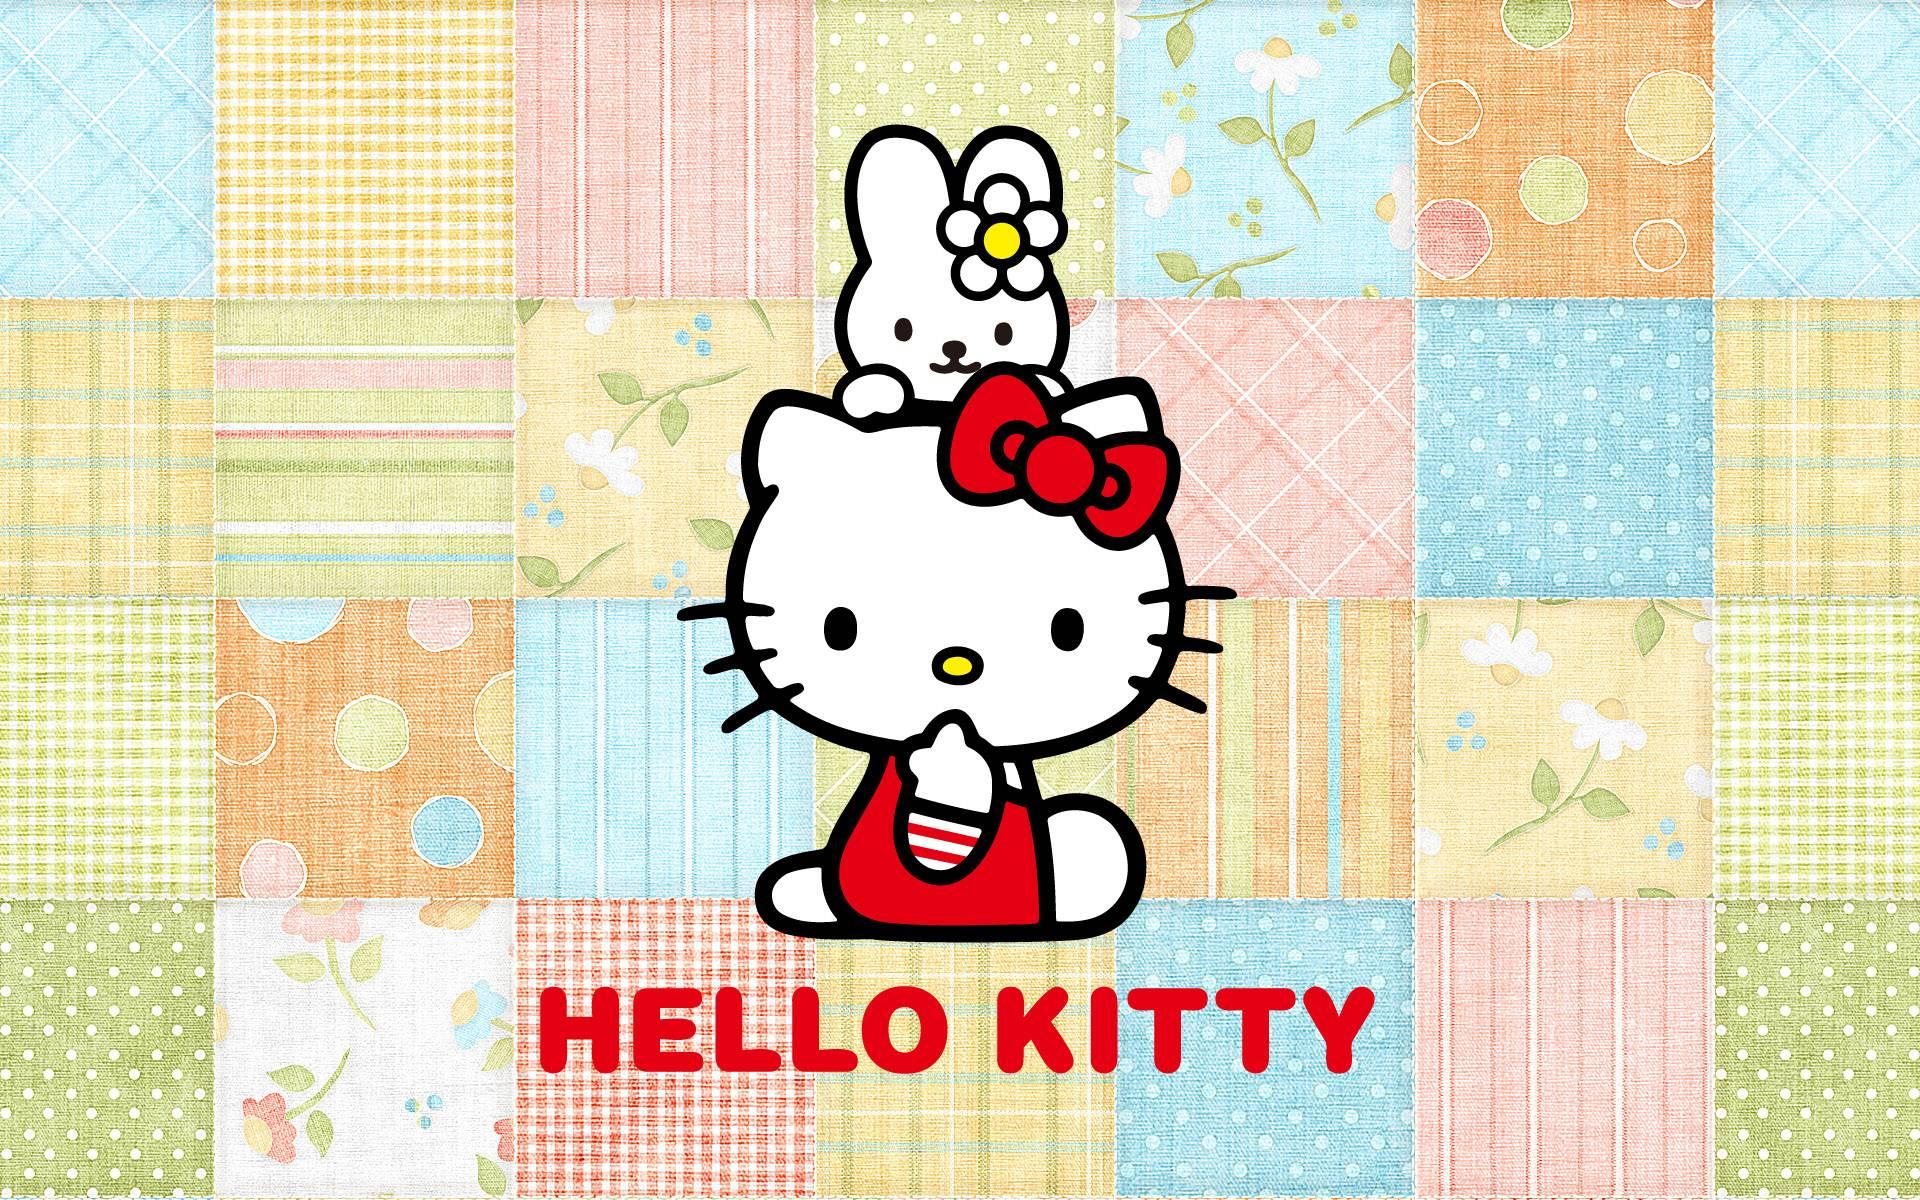 hello kitty wallpaper free - photo #36